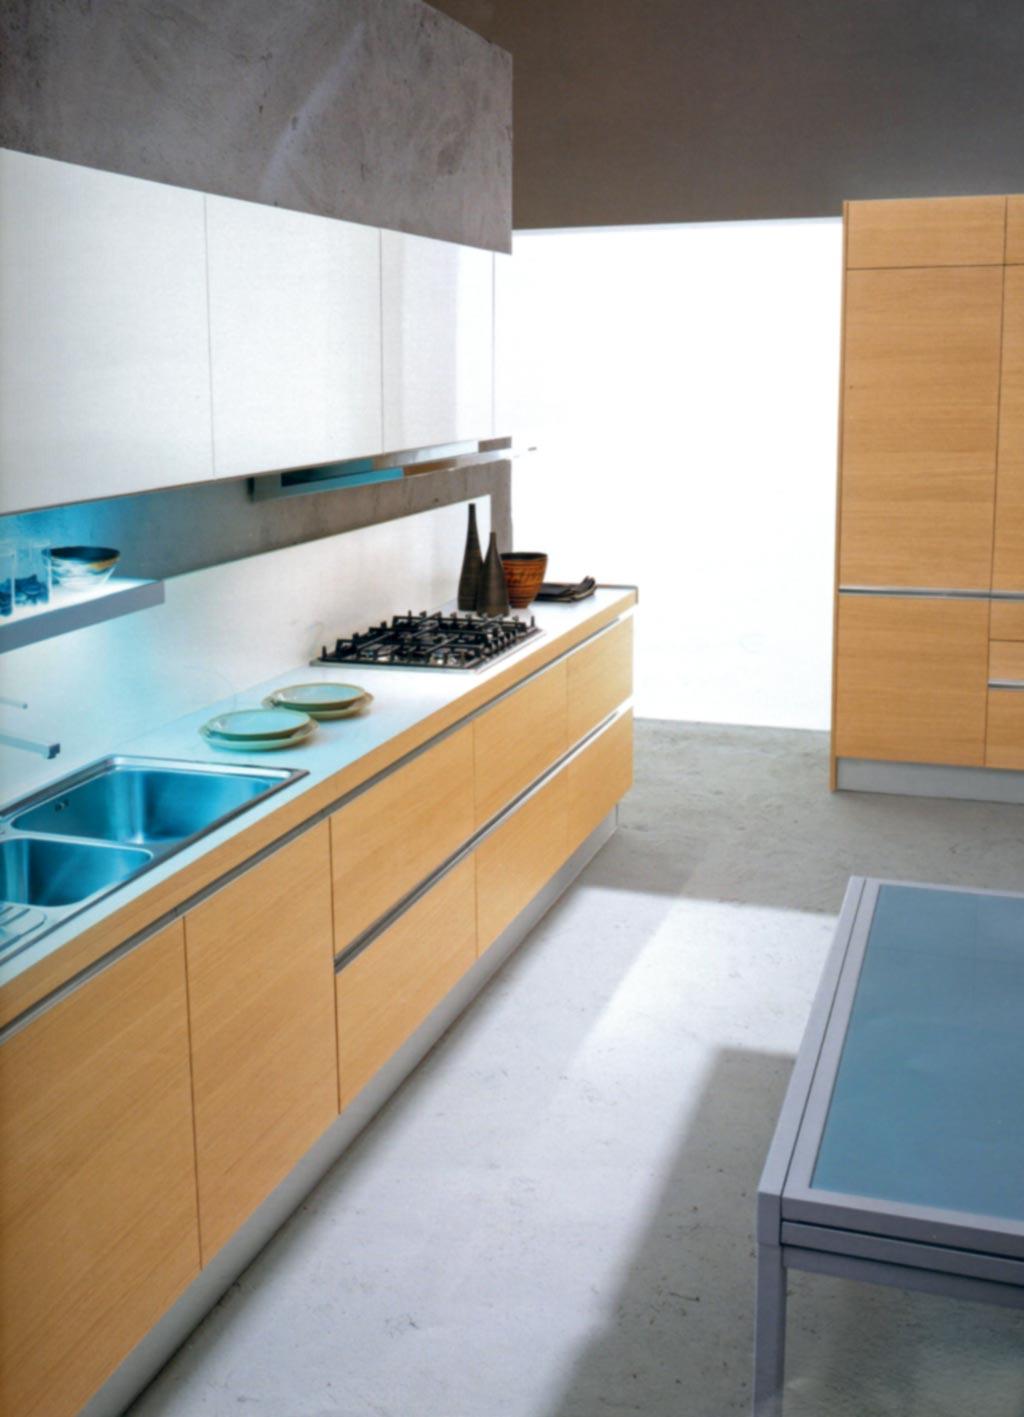 Cucina moderna Mare - Rivenditori cucine Sicilia